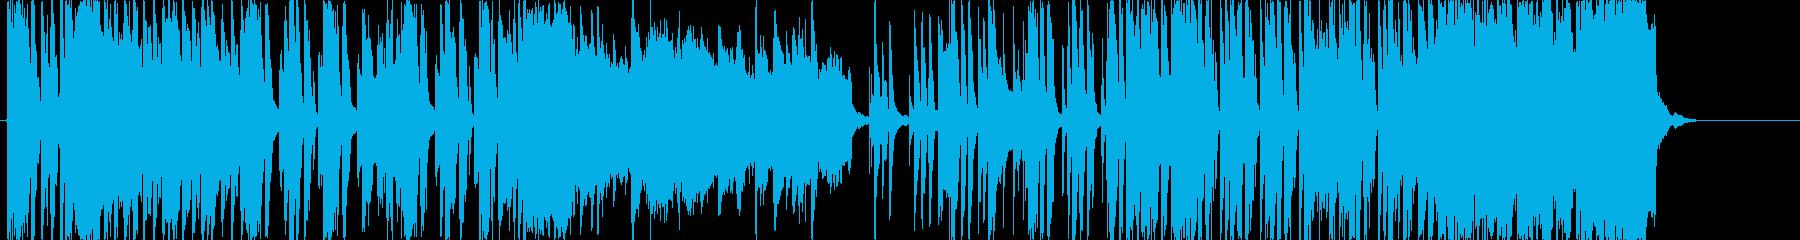 Overture-明るい冒険の始まりの再生済みの波形